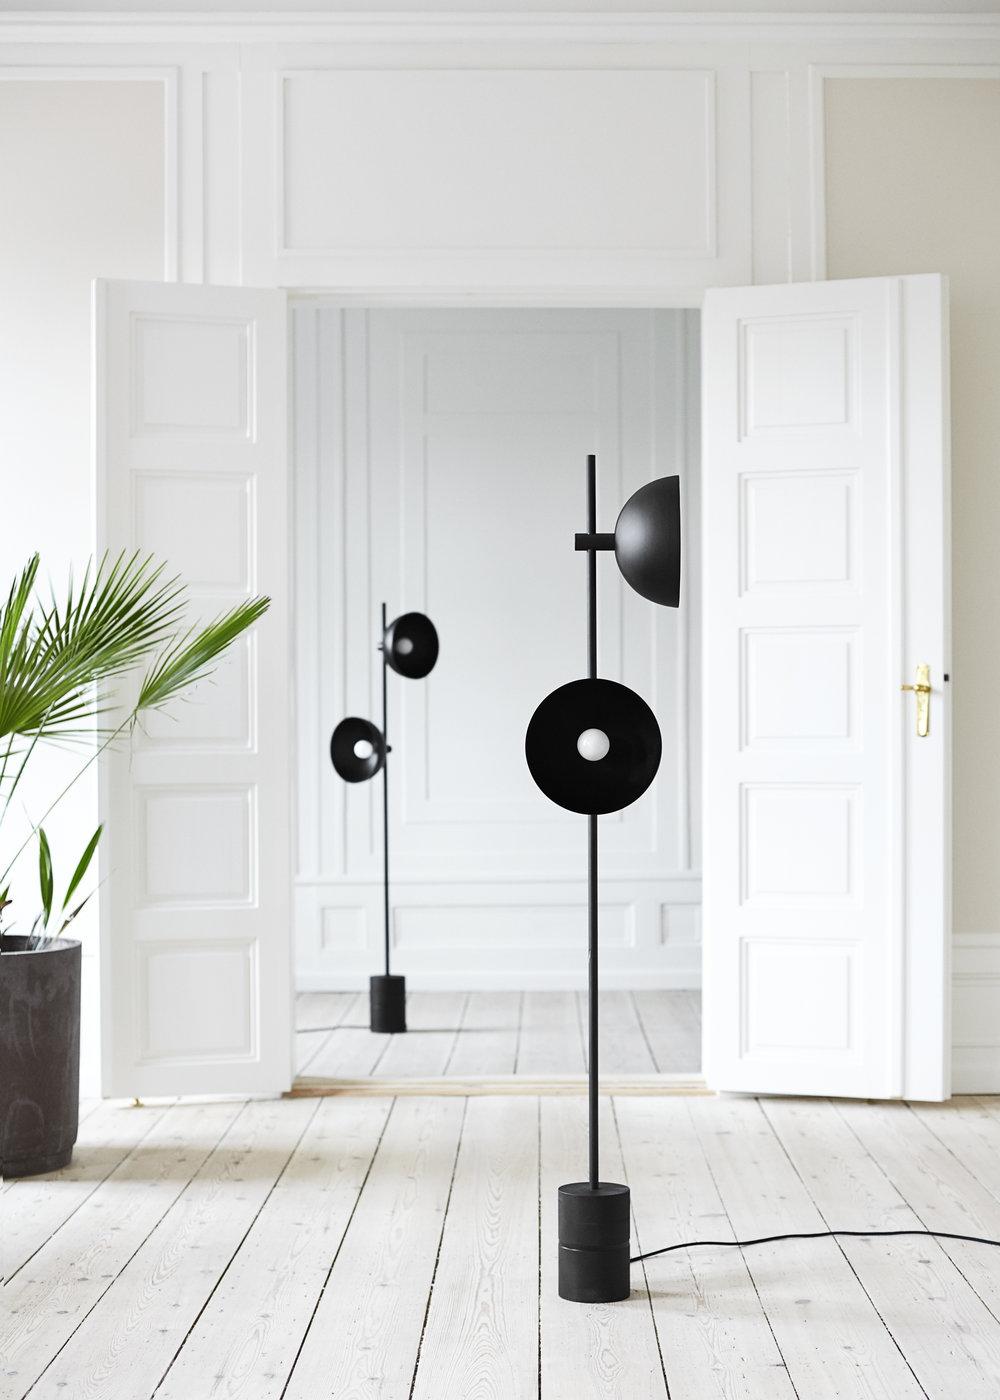 Studio Lamp  by  Laura Bilde , 2016